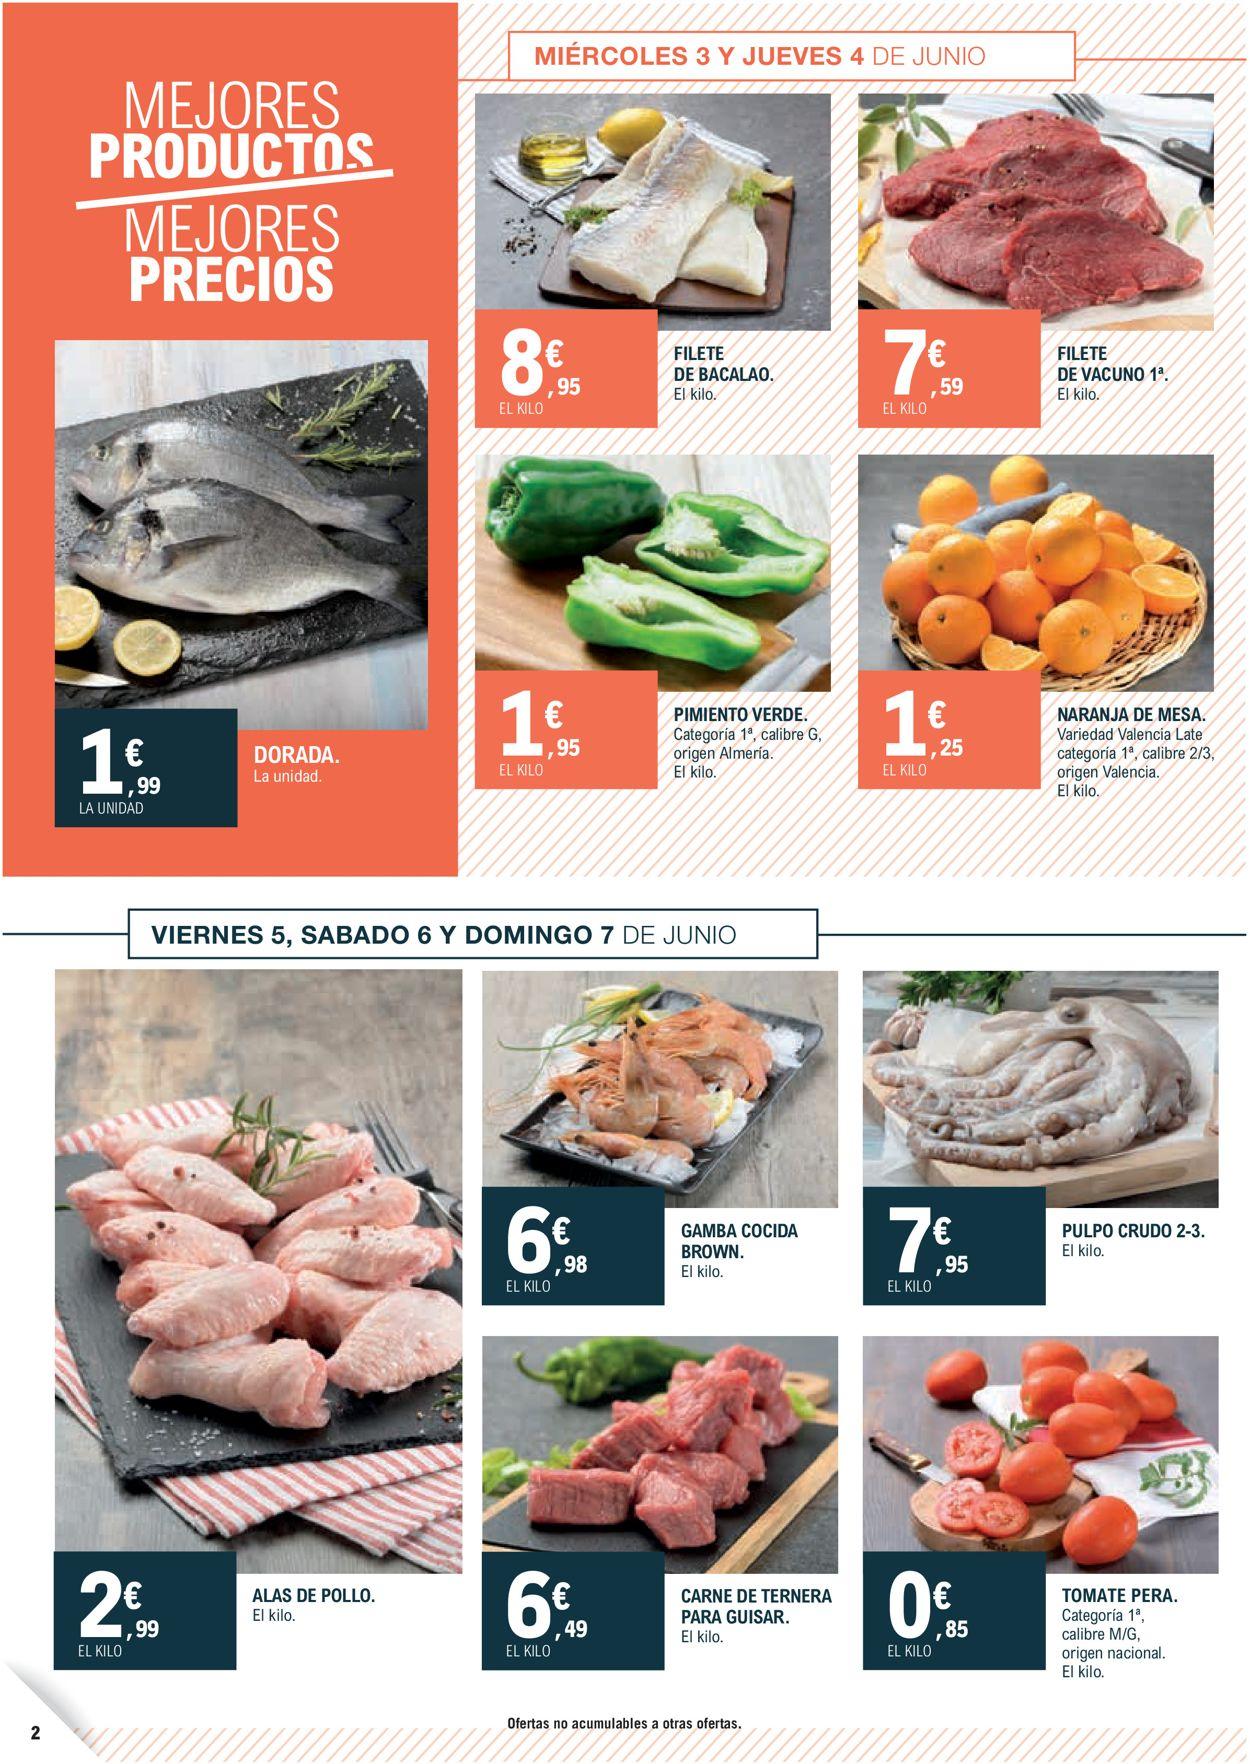 E.leclerc Folleto - 03.06-14.06.2020 (Página 2)